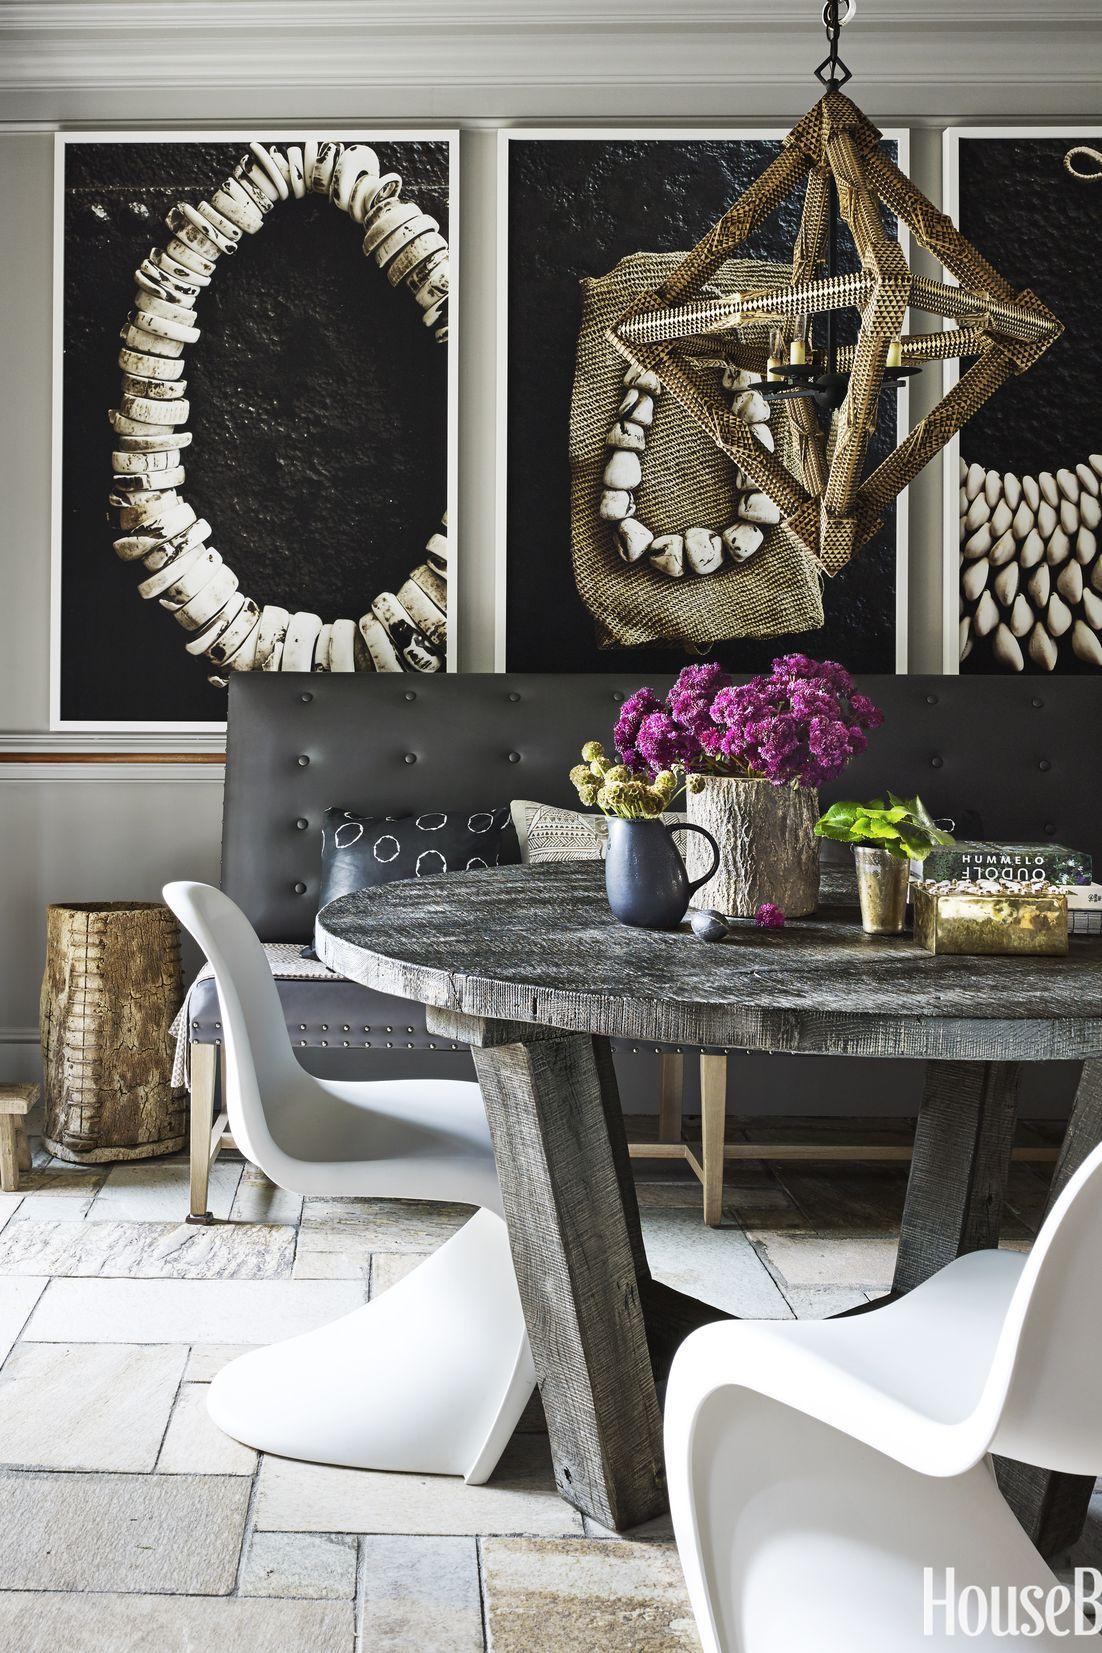 15 Rustic Dining Room Ideas Best Rustic Dining Room Design Inspiration